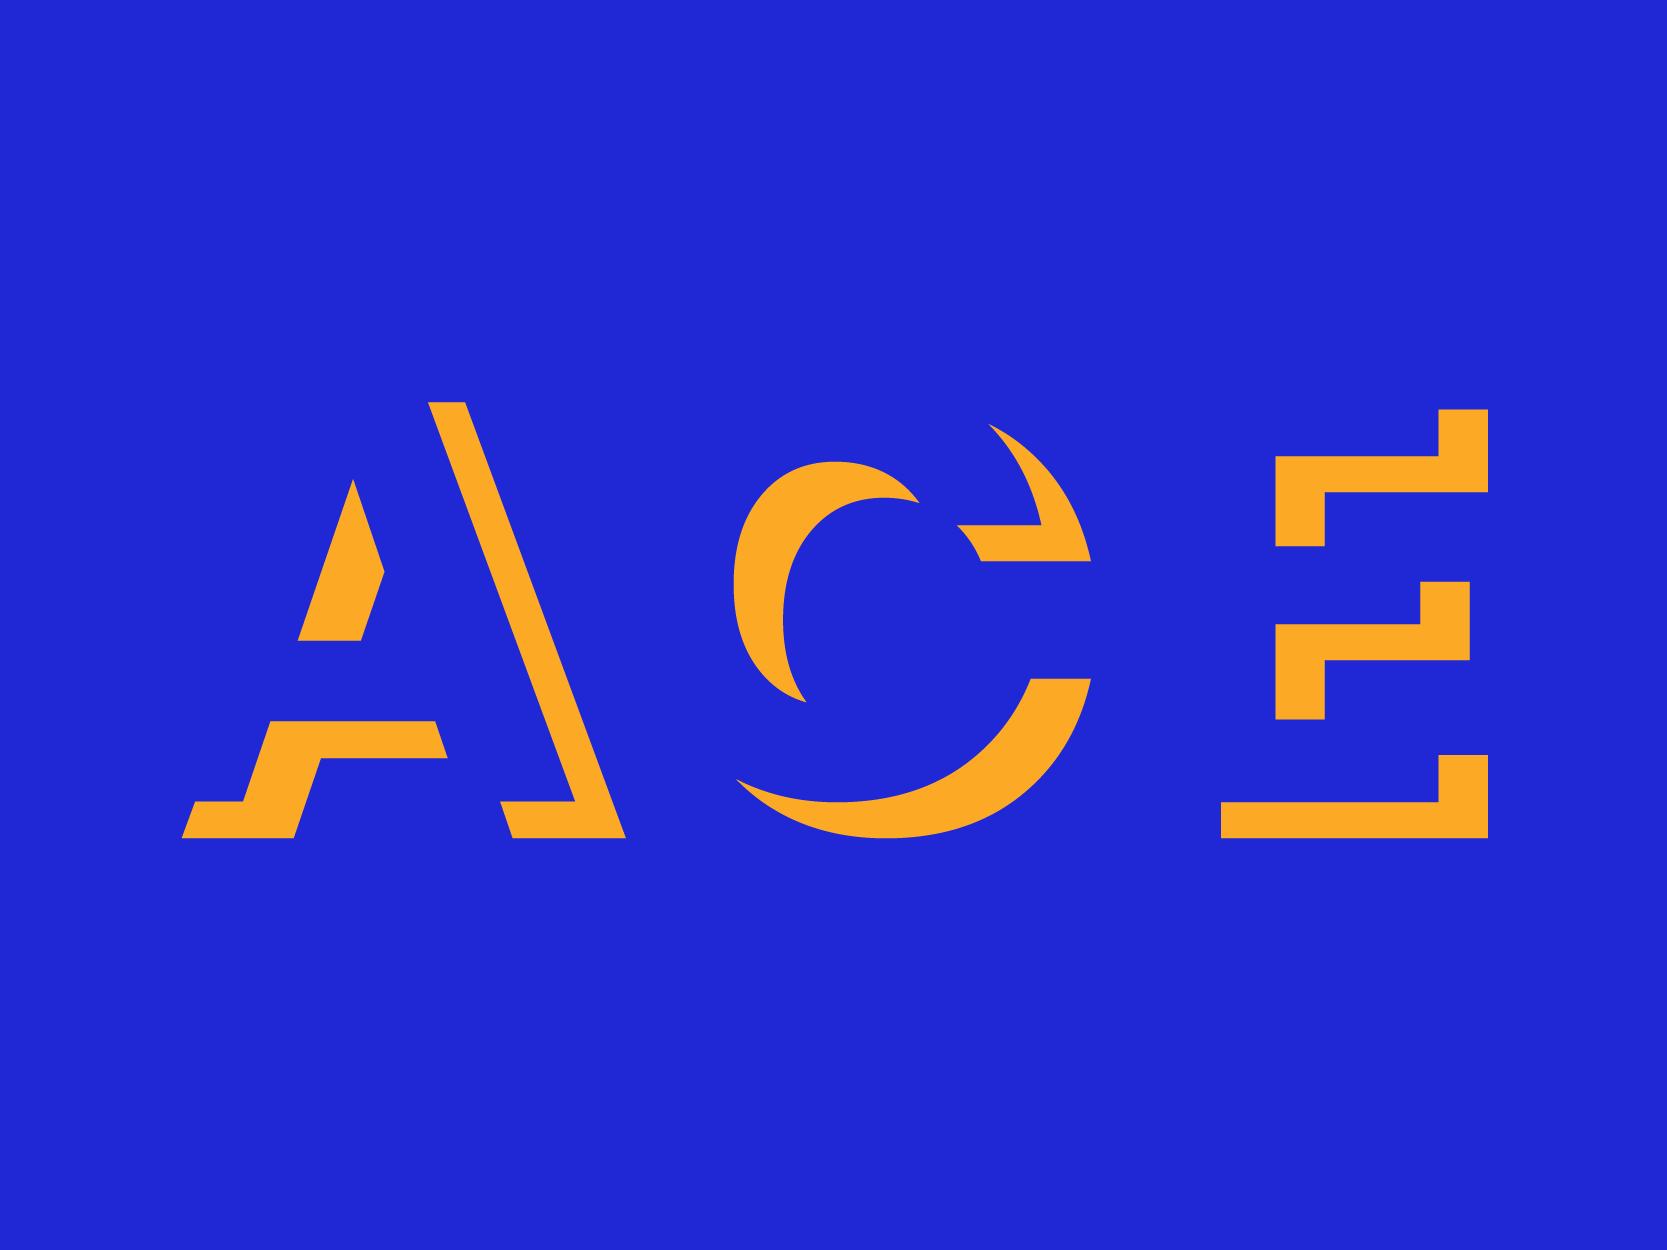 Ace dribbble logo 01